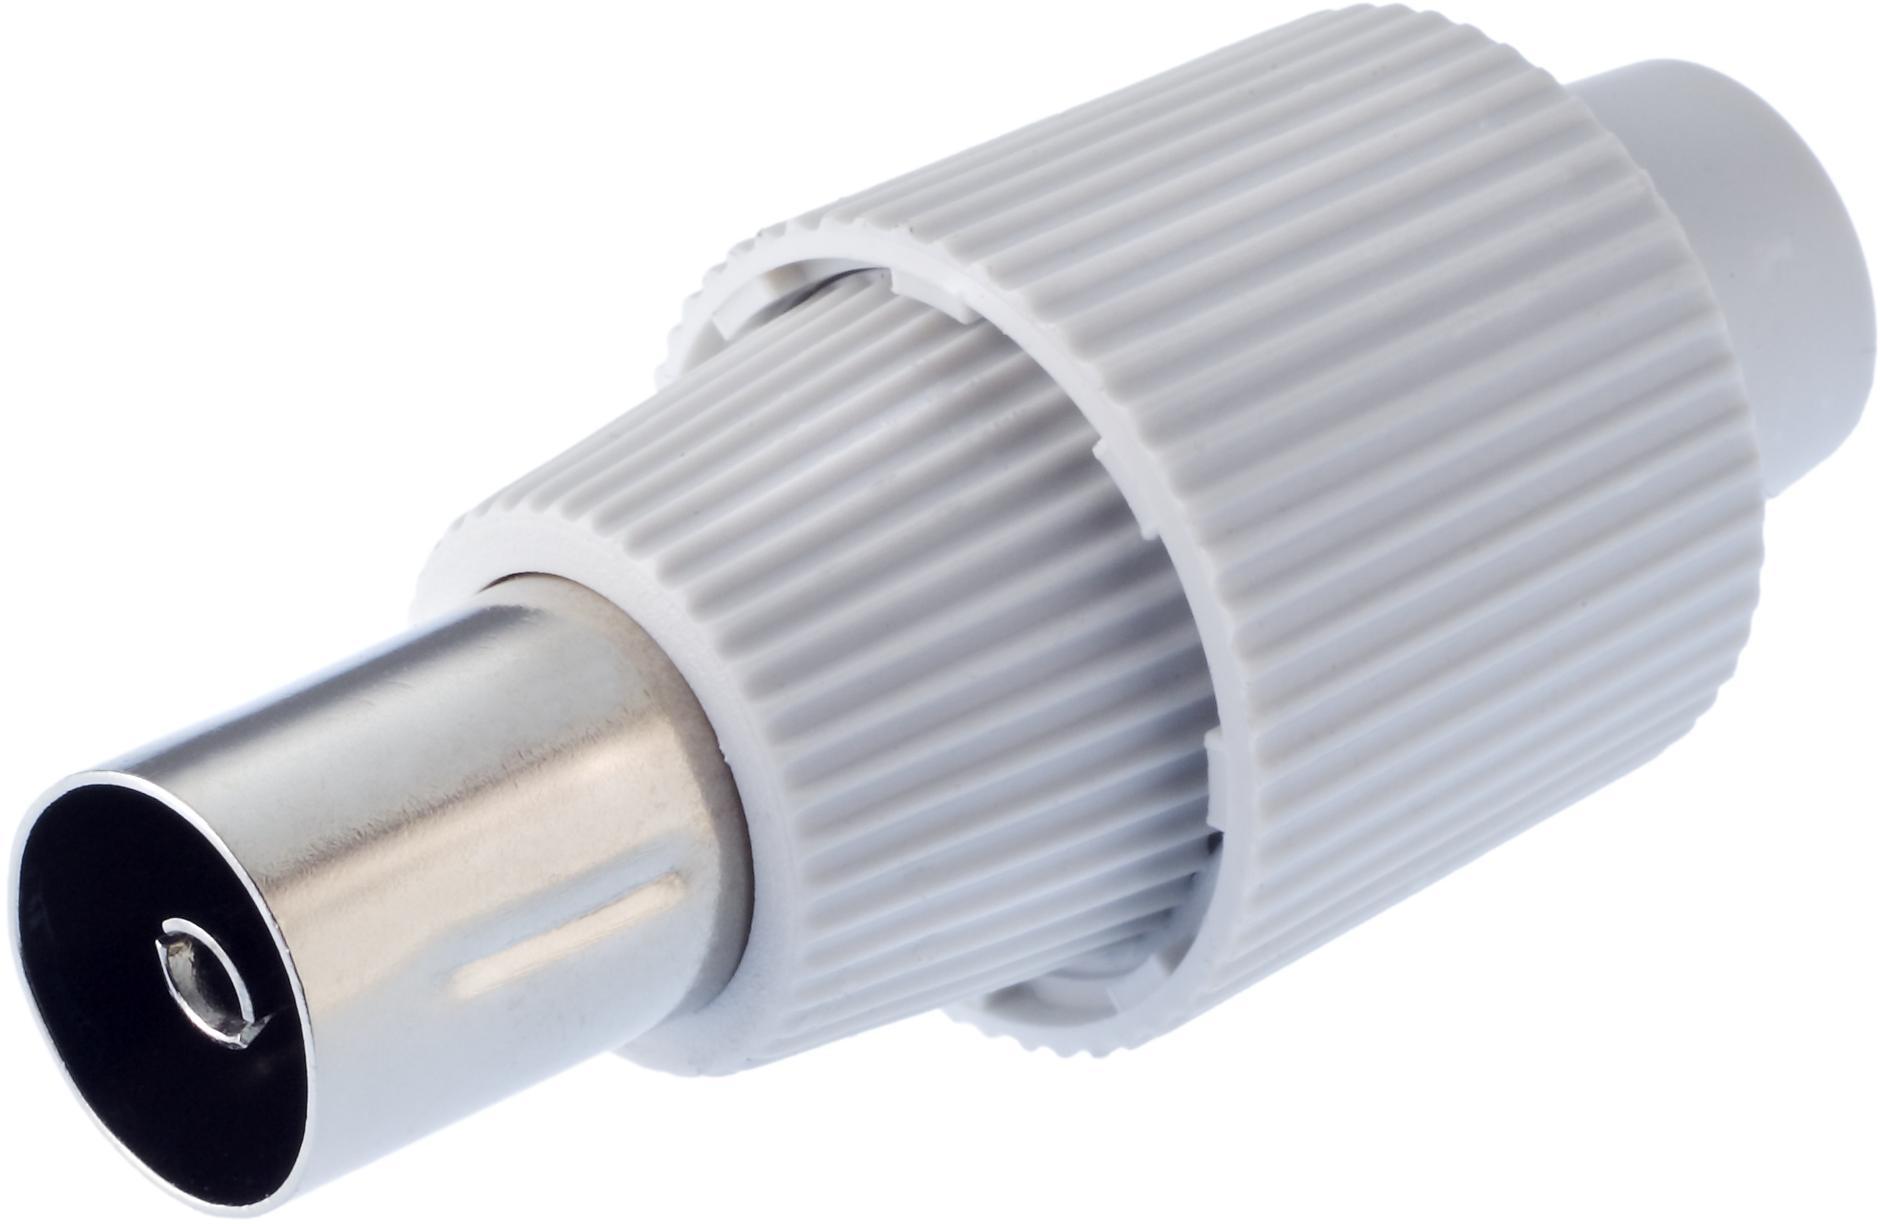 Antenna Angle Plug /& Socket Coax introduction Mounting koaxstecker /& koaxbuchse NEW